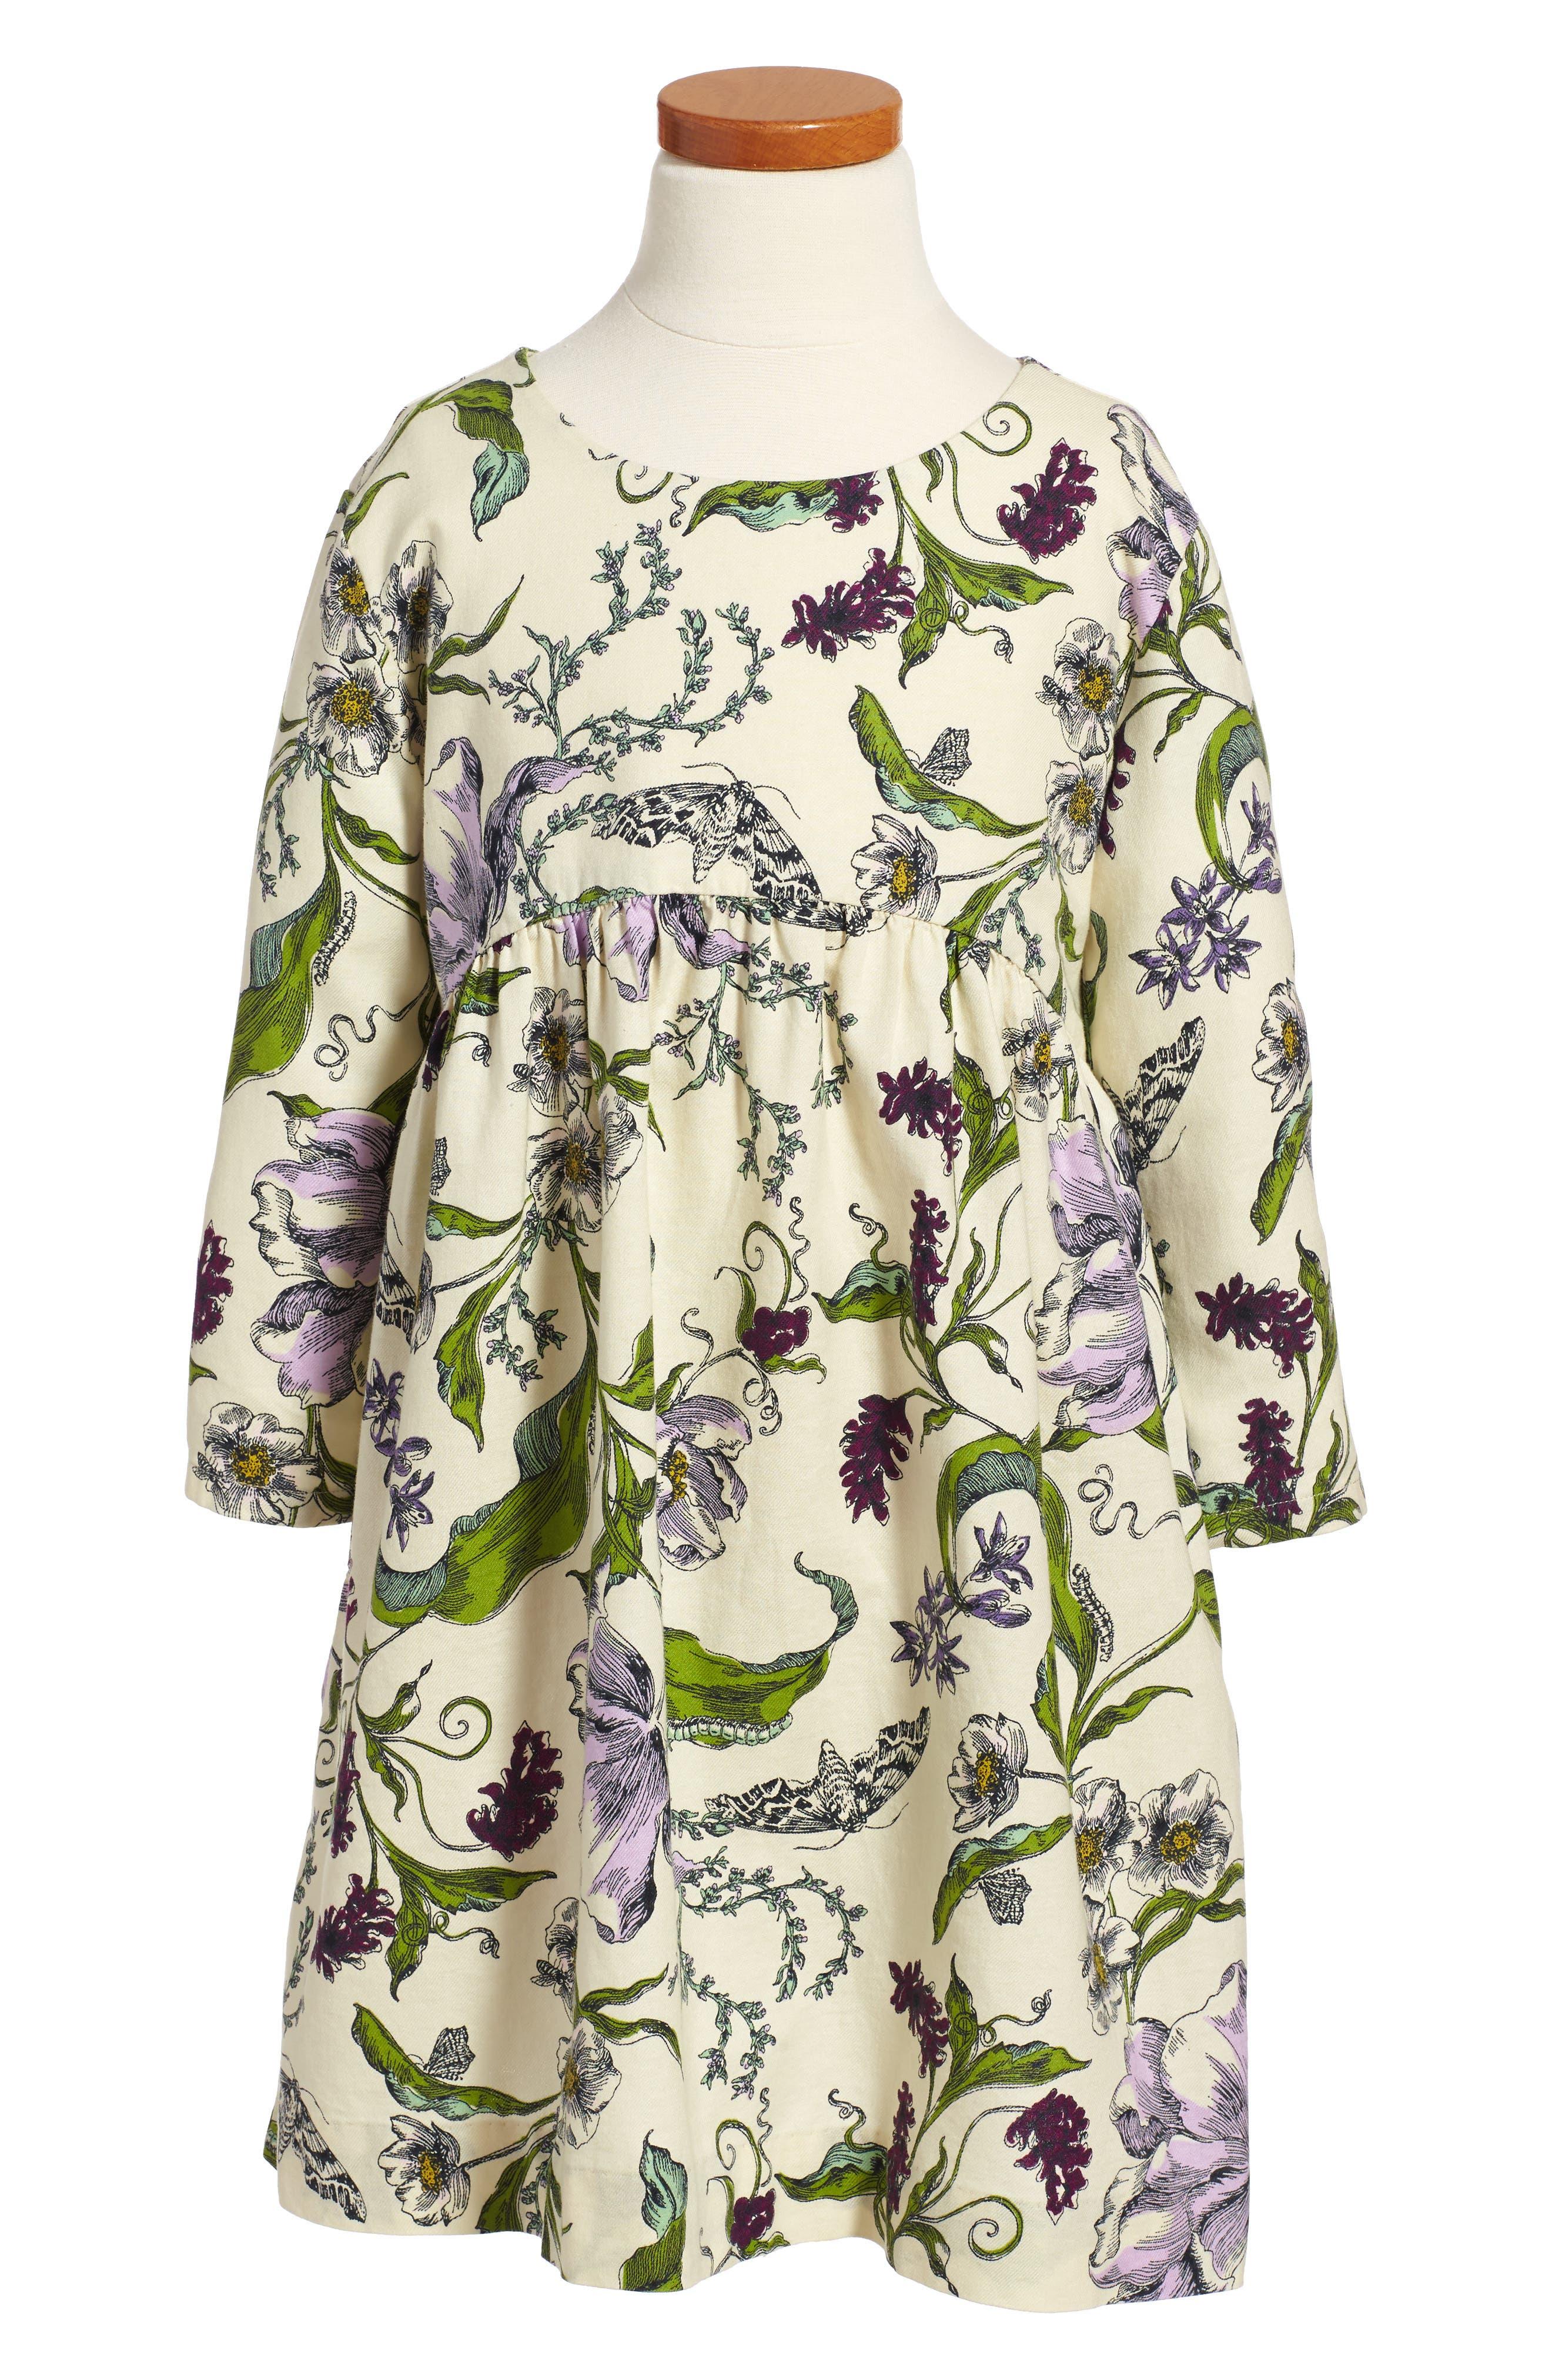 Wallpaper Party Dress,                             Main thumbnail 1, color,                             Cream